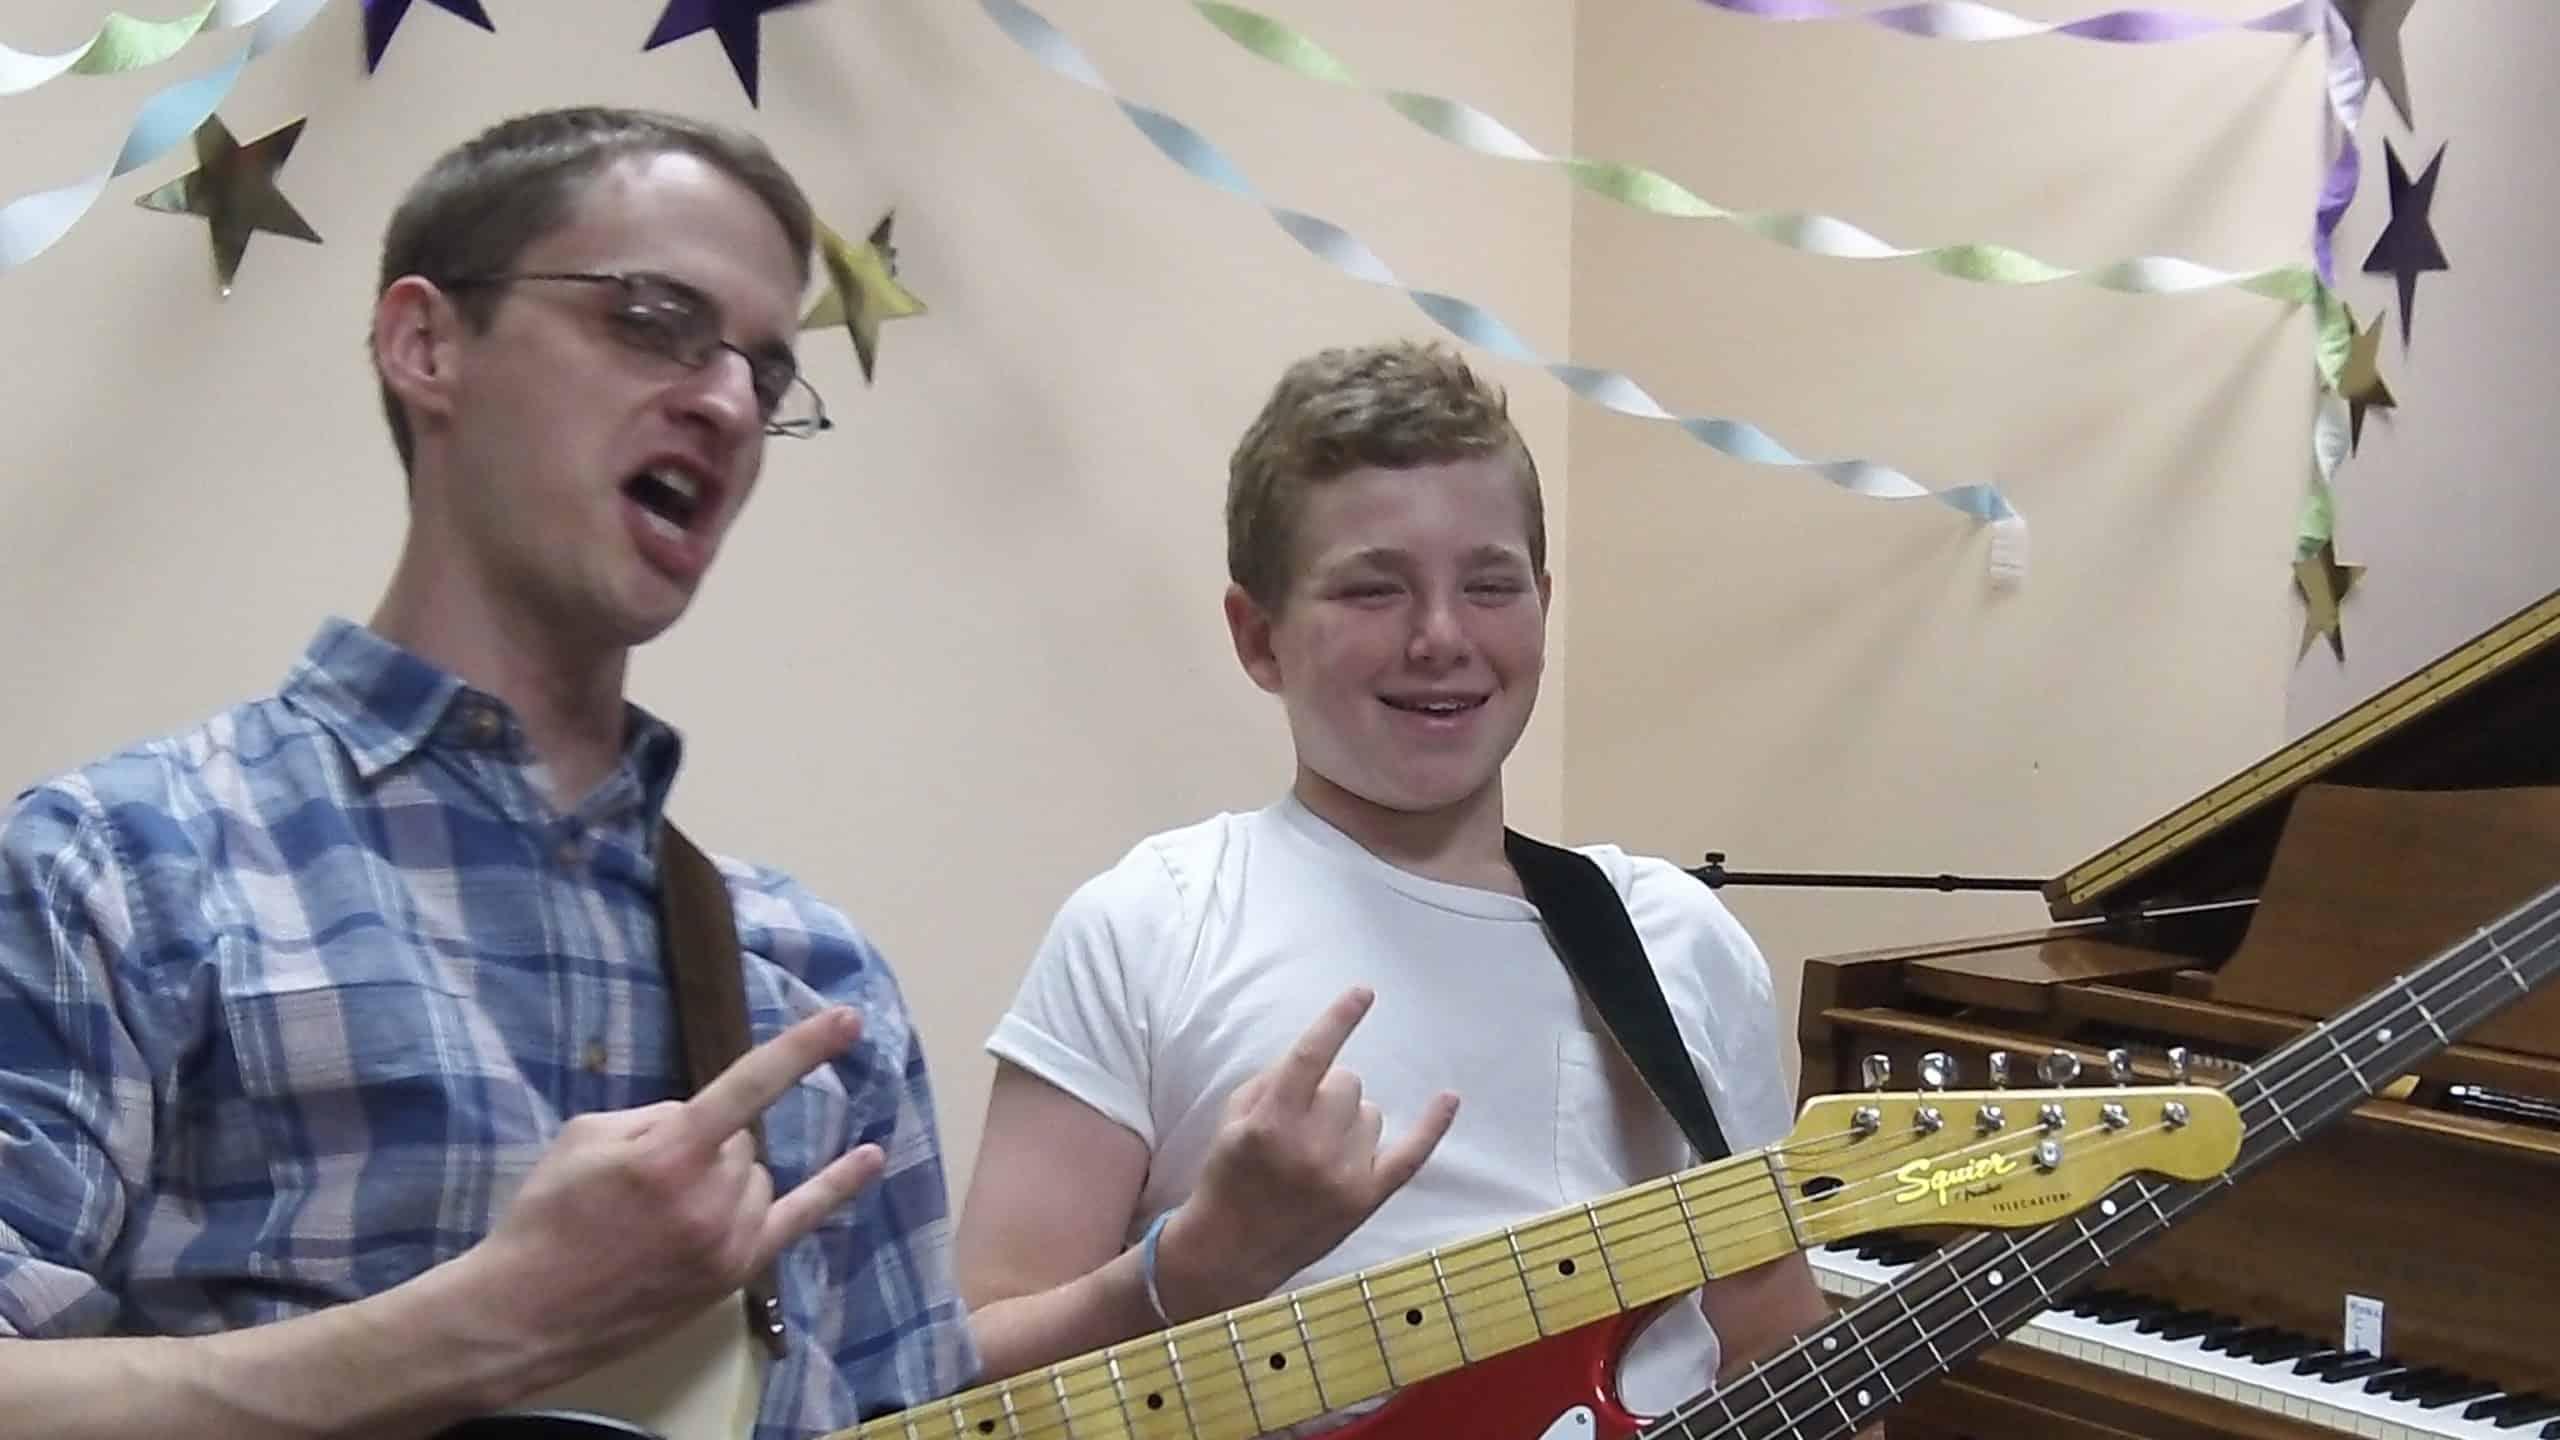 guitar teacher and student give happy devil horns at a recital